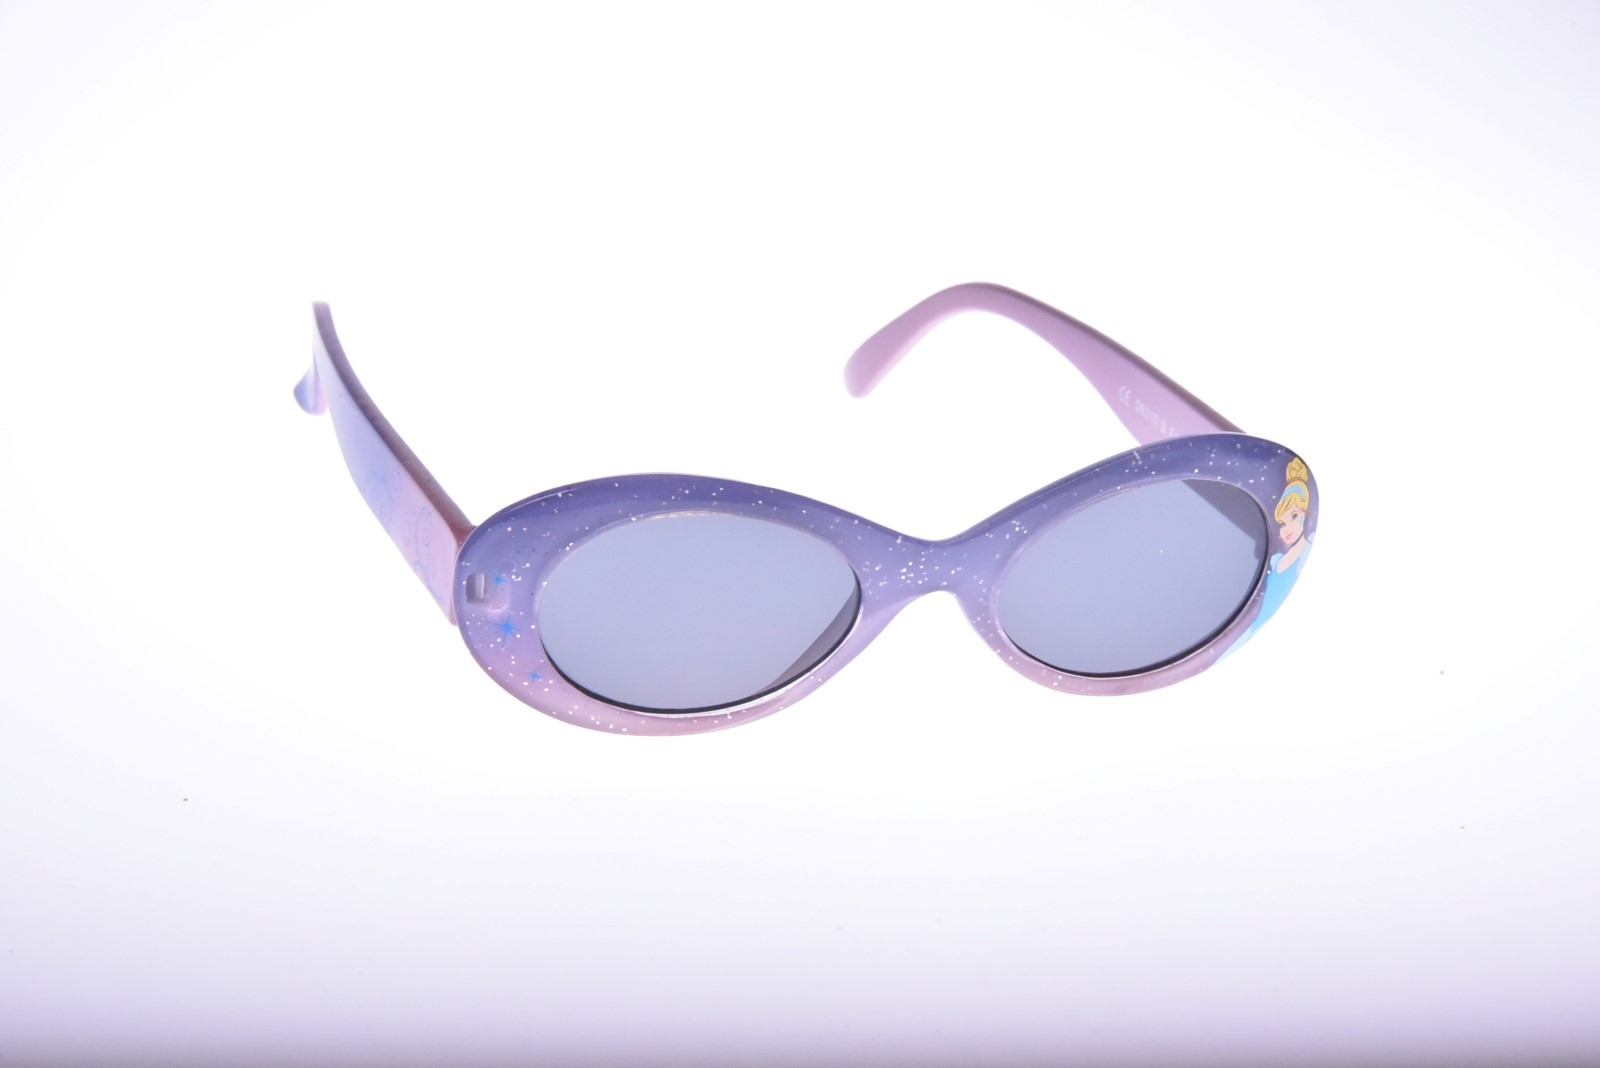 Polaroid Disney D6310B - Slnečné okuliare pre deti 4-7 r.